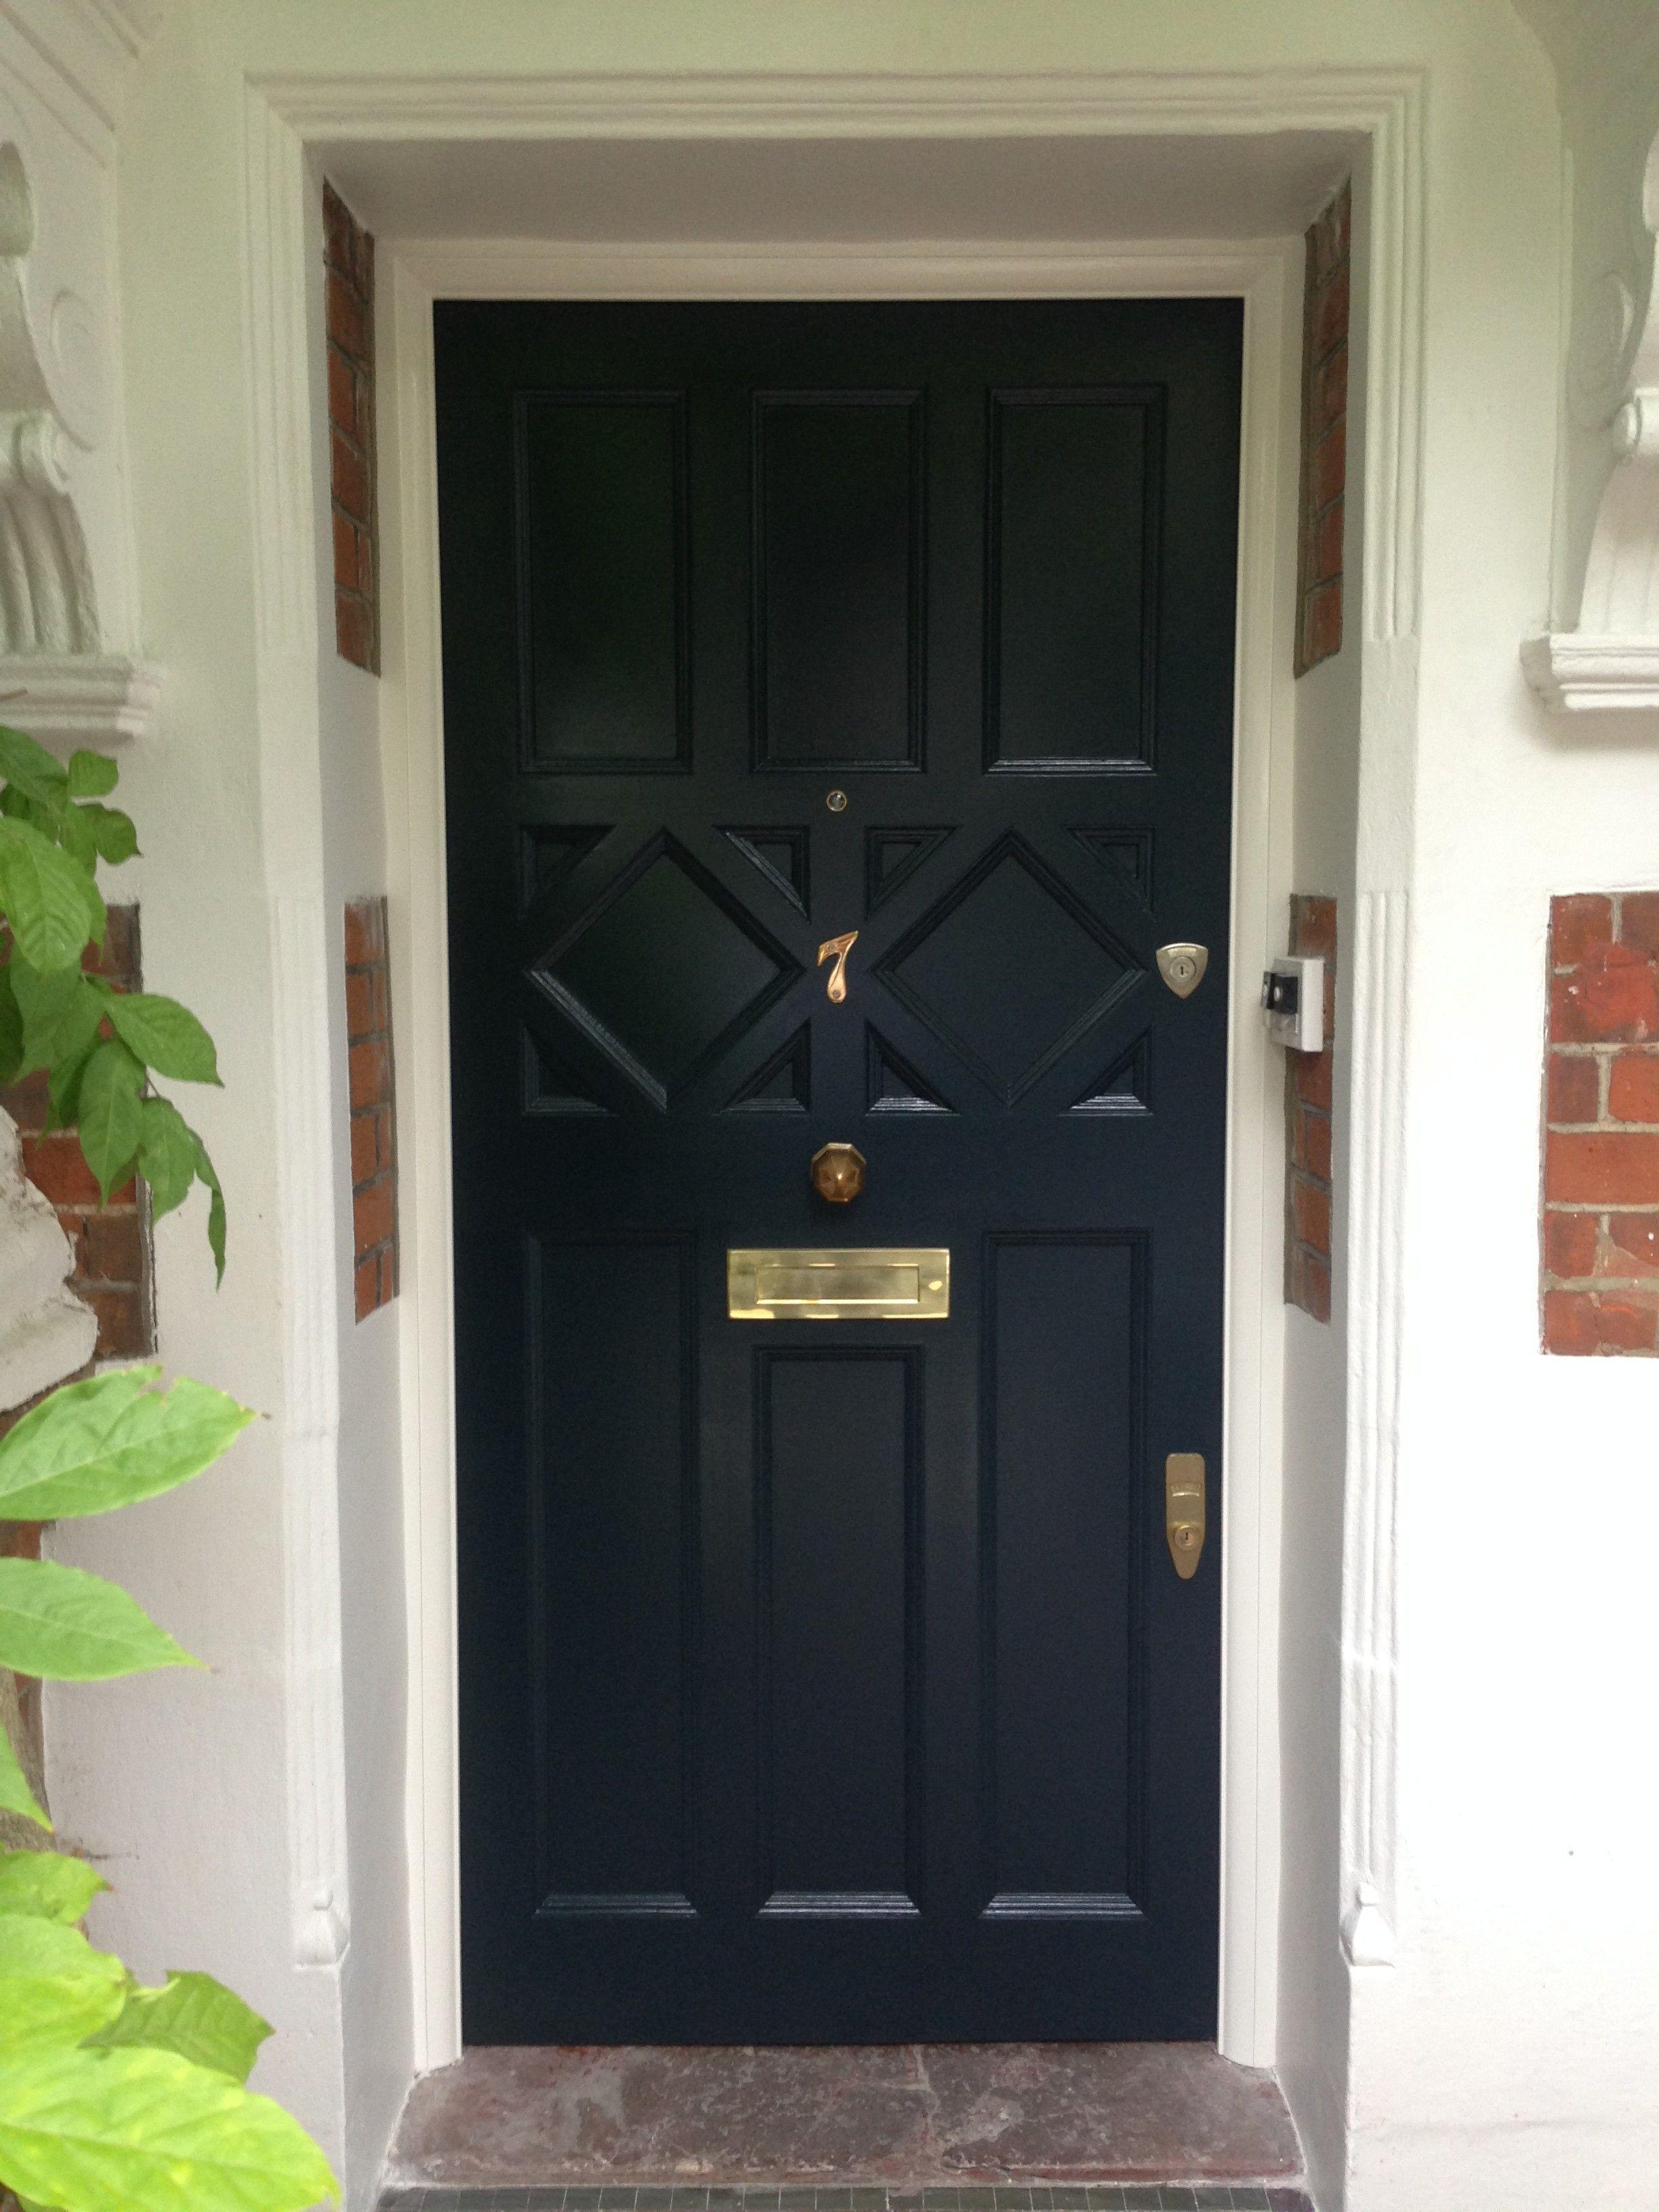 Arts and crafts front door in south west London | Doors | Pinterest ...